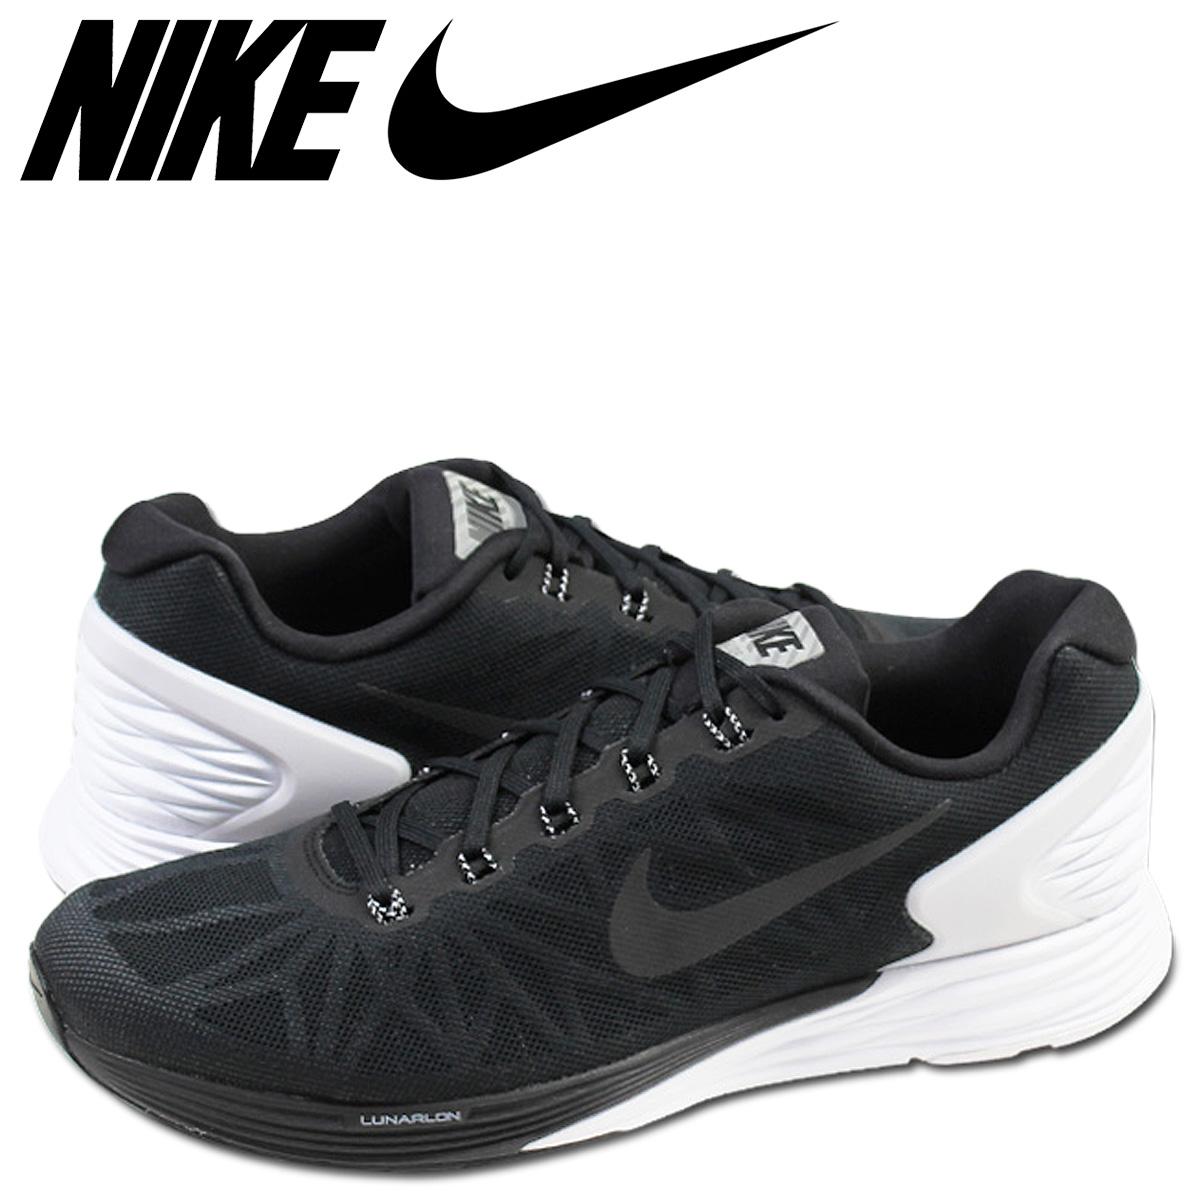 innovative design 908e6 7214c Nike NIKE Luna grayed sneakers LUNARGLIDE 6 SP YIN-YANG PACK summer  solstice limited 700097 ...